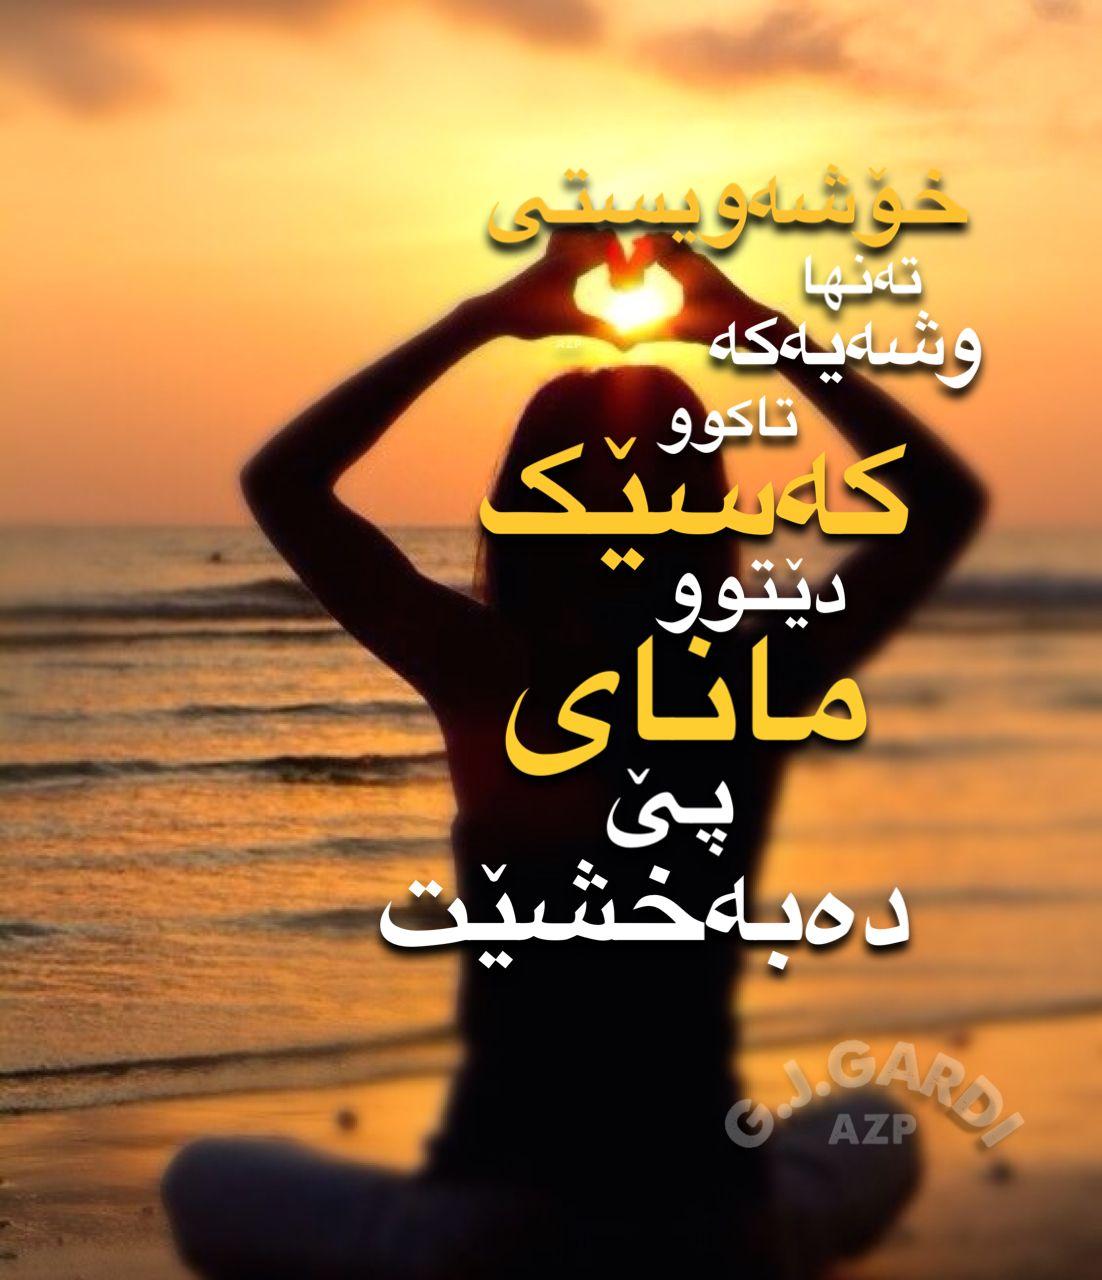 Love Is Just A Word Until Someone Come Along And Gives It Meaning الحب هو مجرد كلمة حتى يأتي شخص ما على طول ويعطيها معنى Iraq Clio Kurdistan